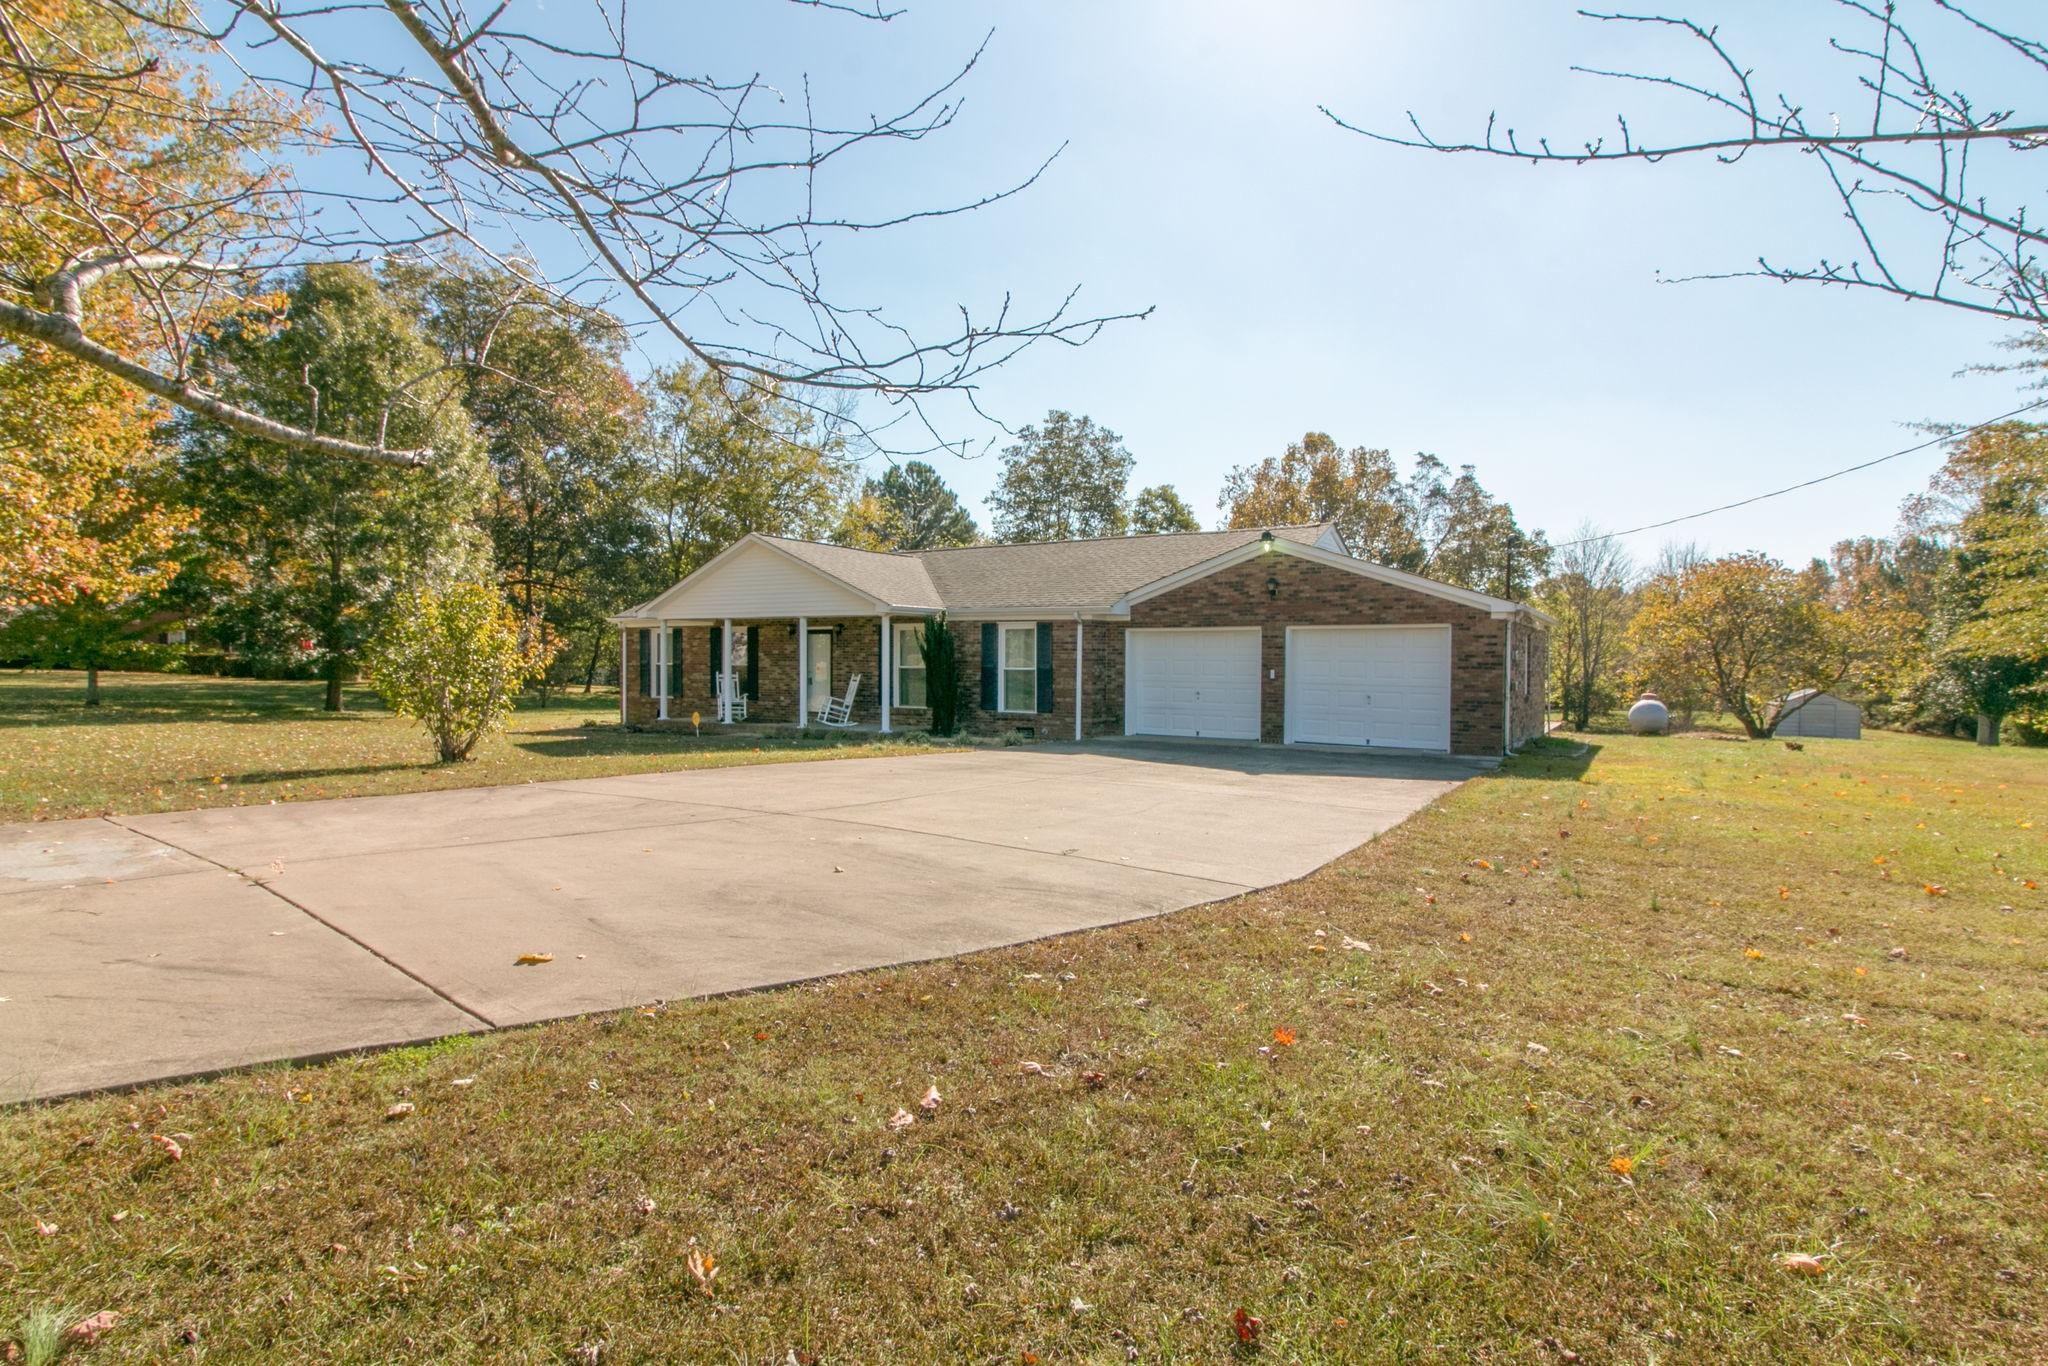 1668 Lock B Rd, N, Clarksville, TN 37043 - Clarksville, TN real estate listing